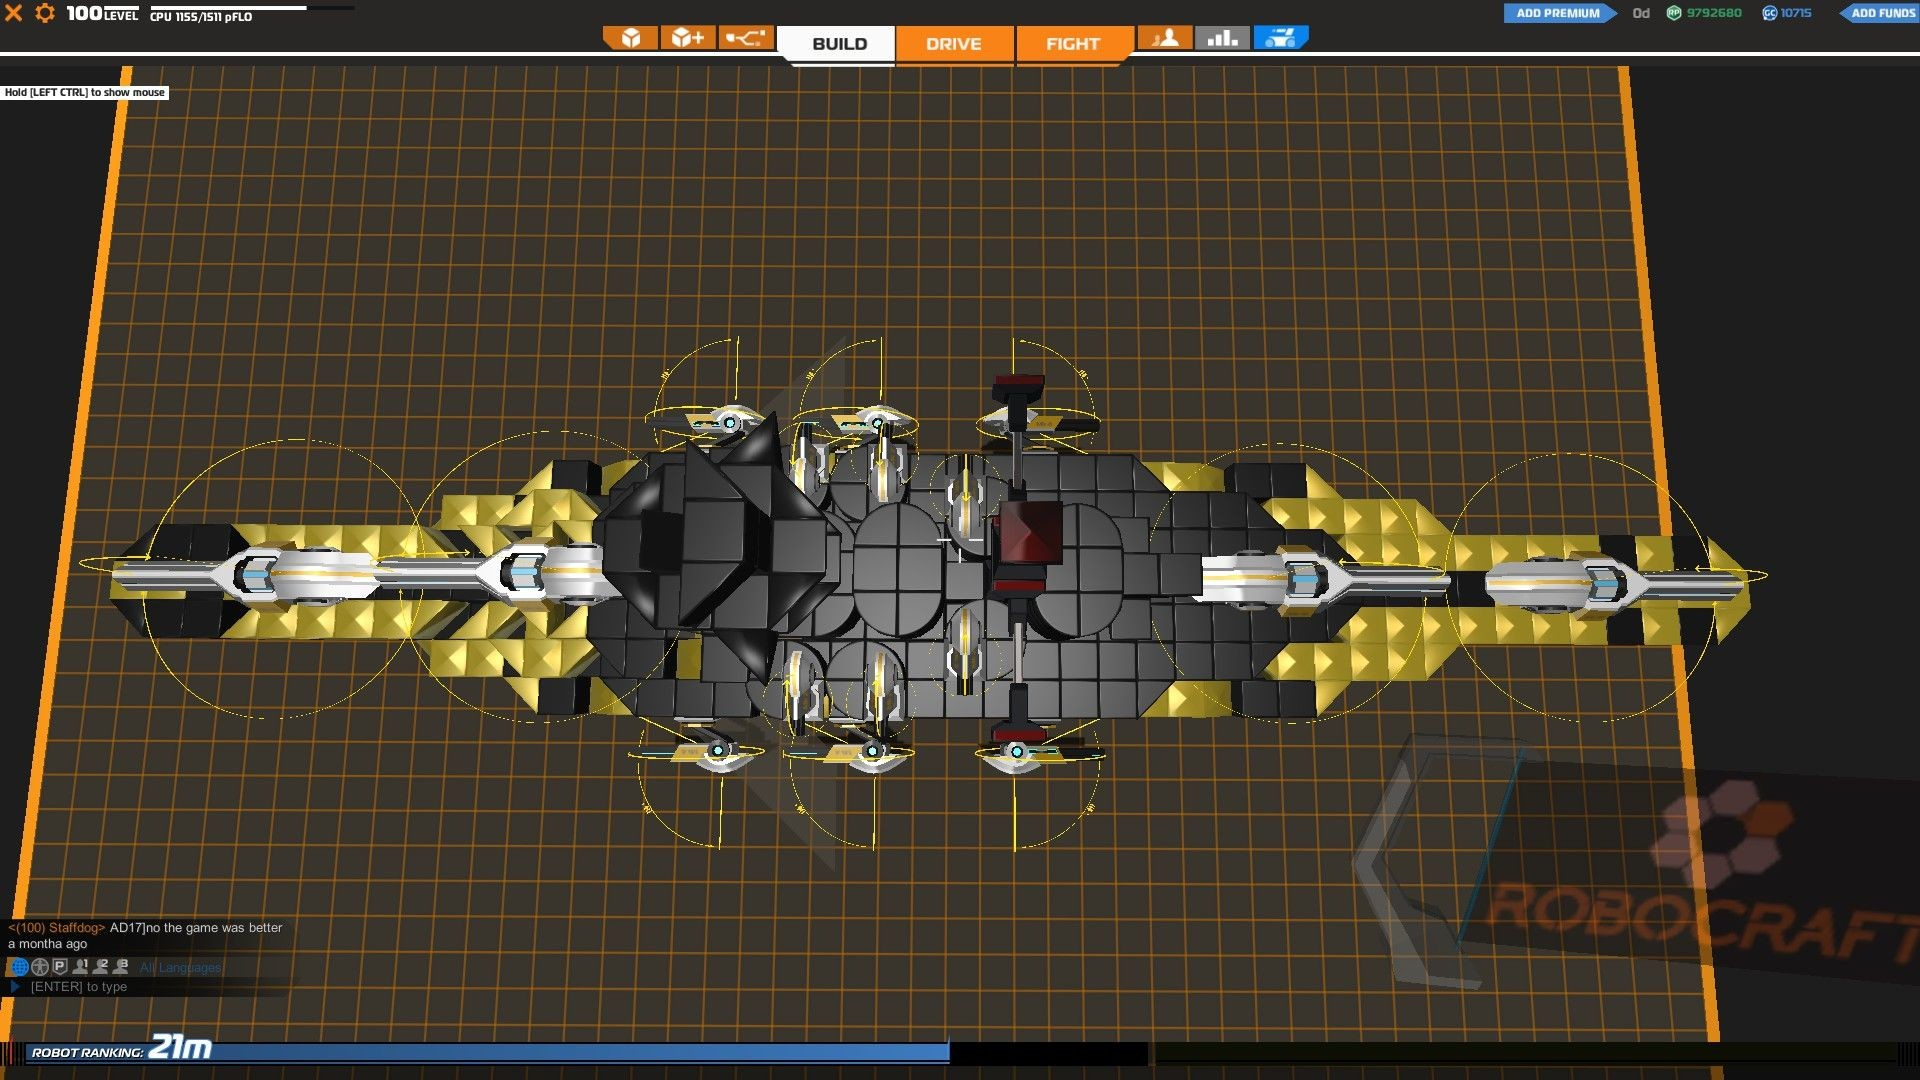 [Arpeggio of Blue Steel] Battleship-Haruna. SMG Drone added 2 years ago